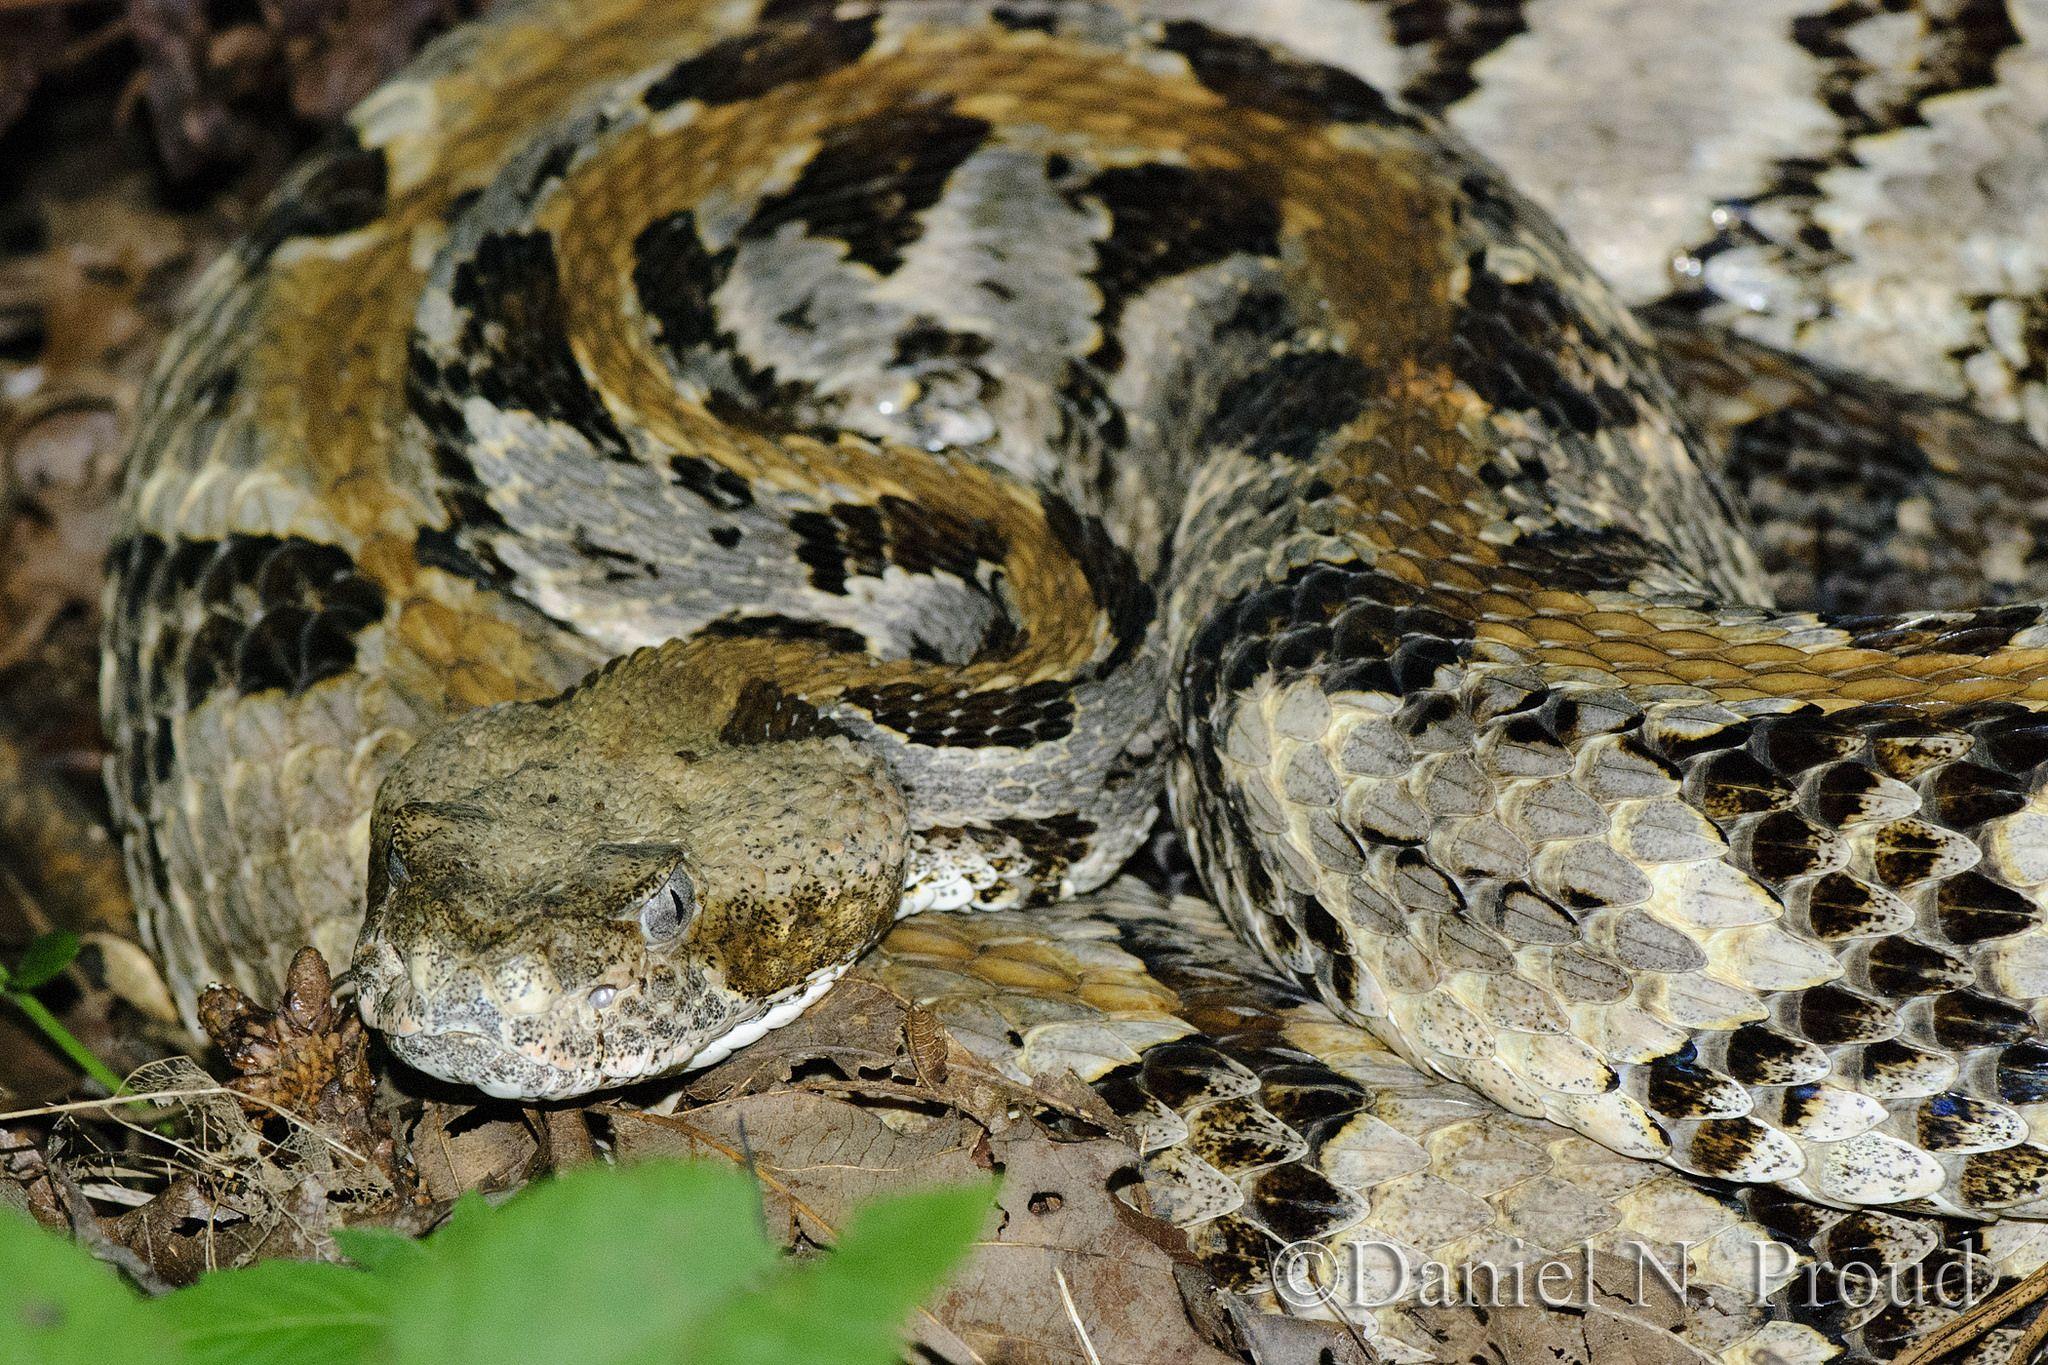 Timber_rattlesnake